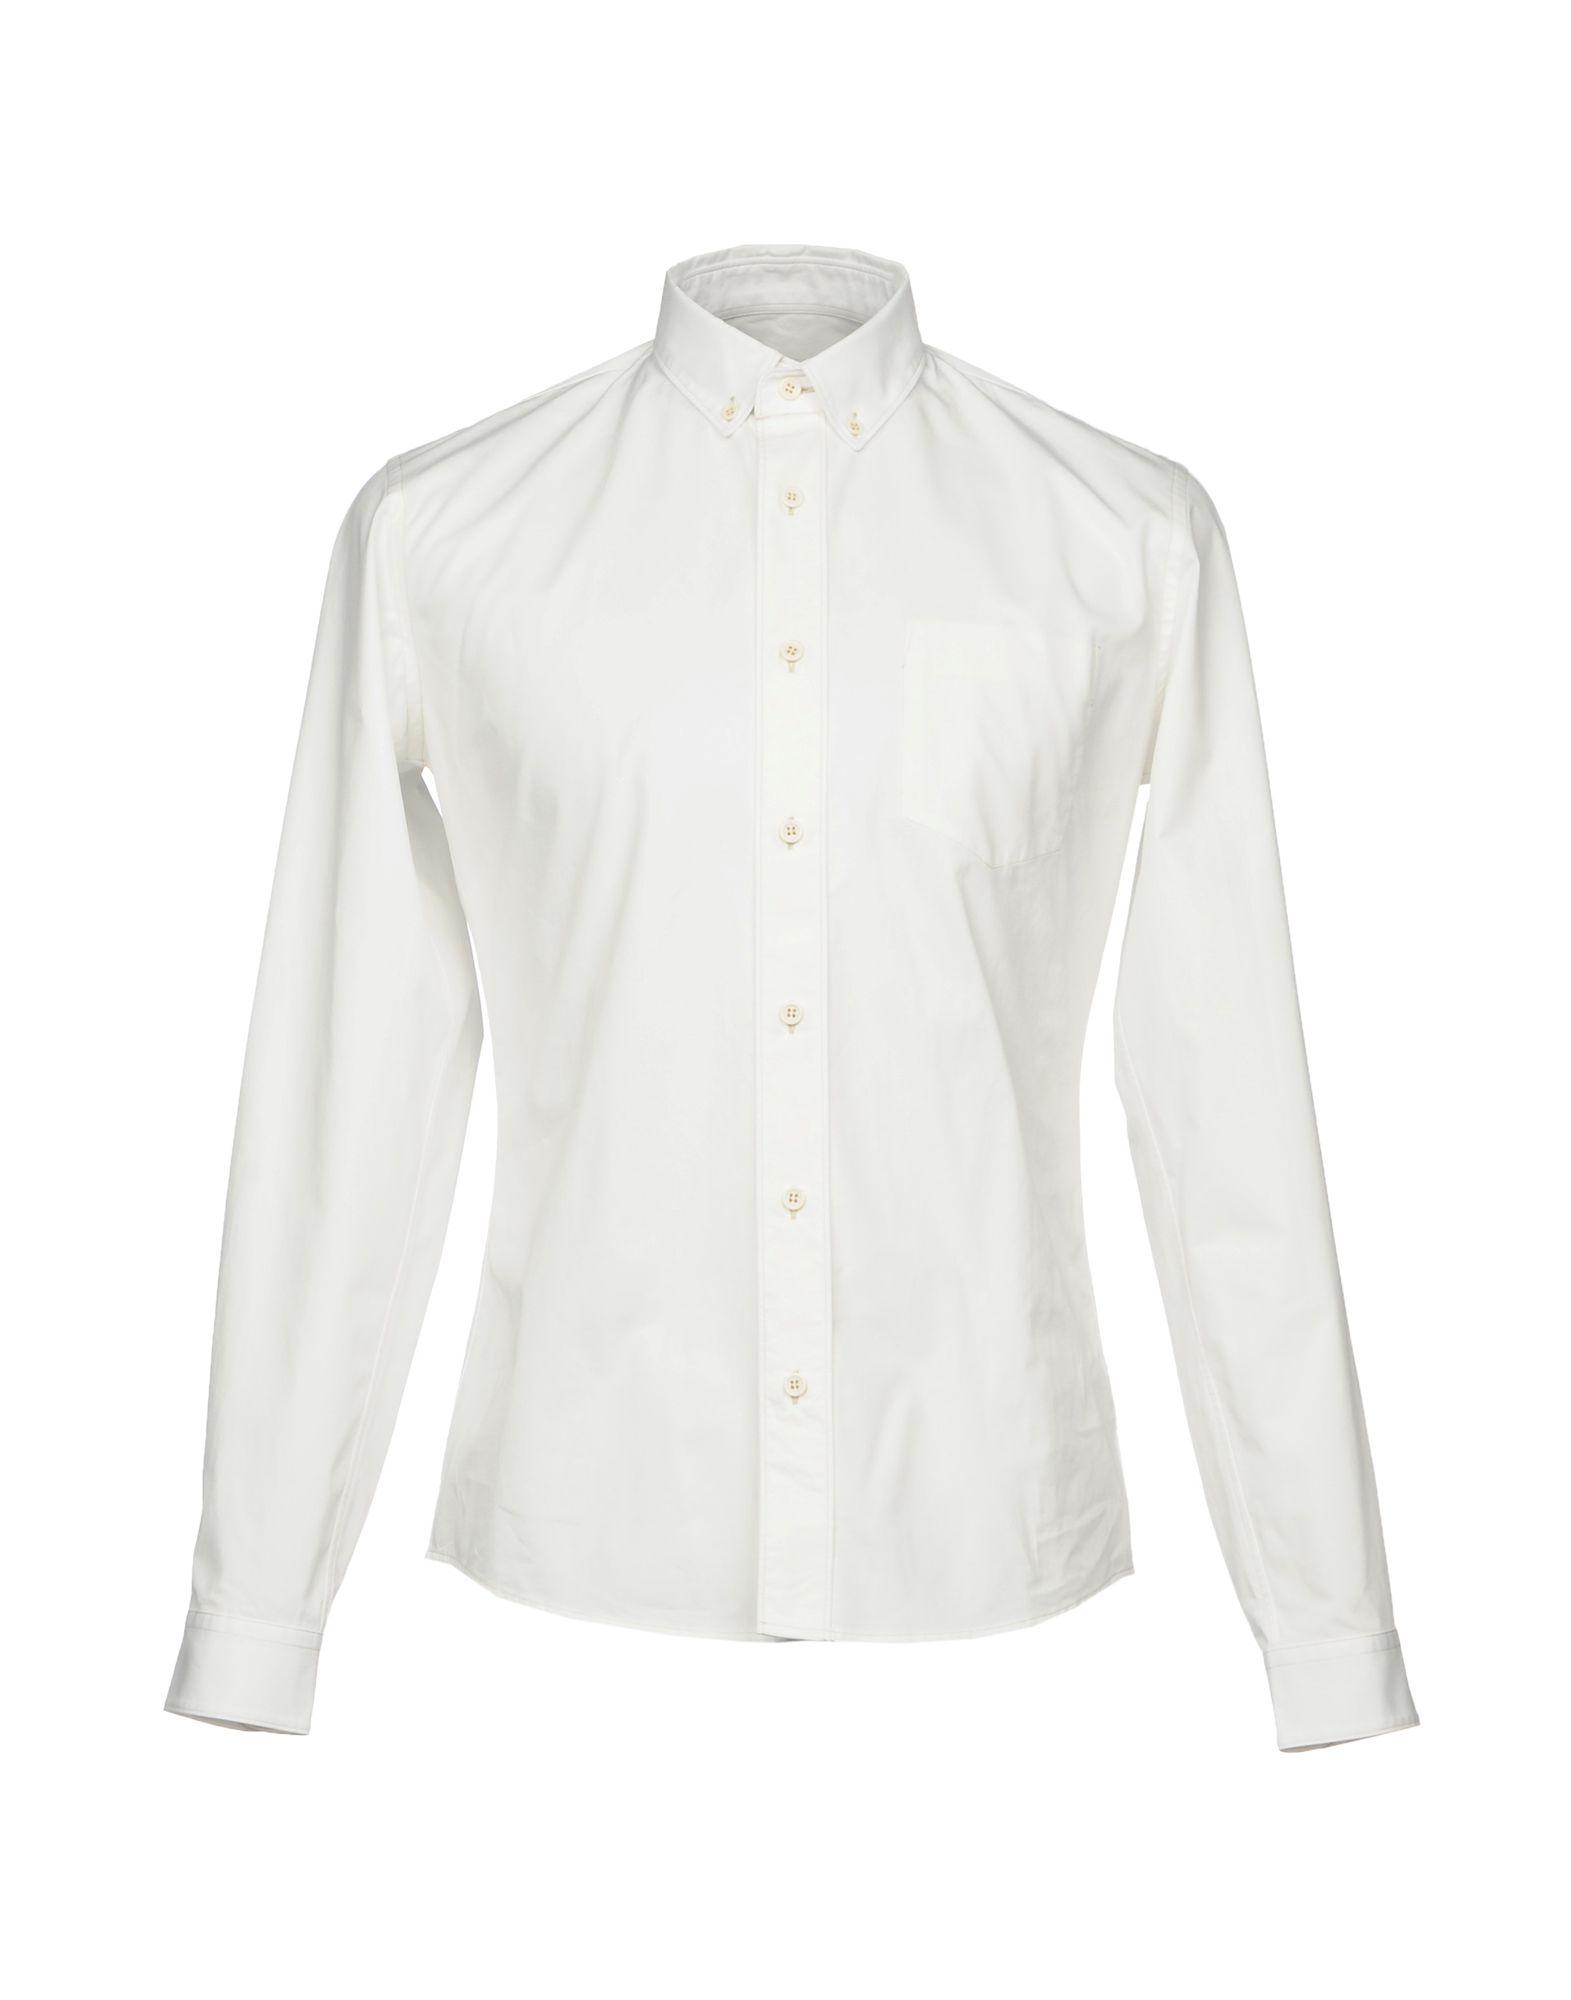 Camicia Tinta Unita Golden Goose Deluxe Brand Uomo - Acquista online su